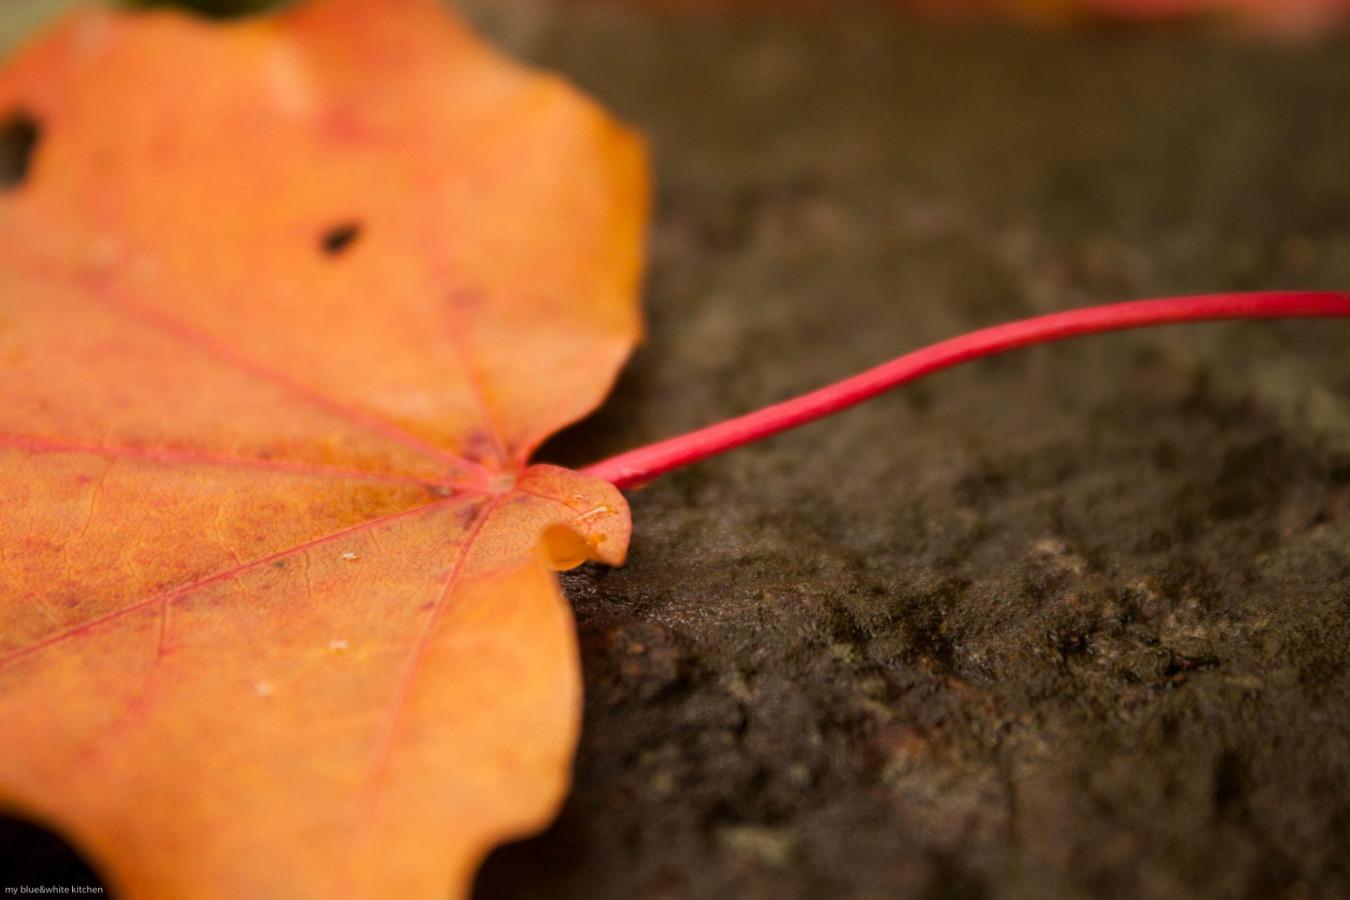 orange_fall_small.jpg